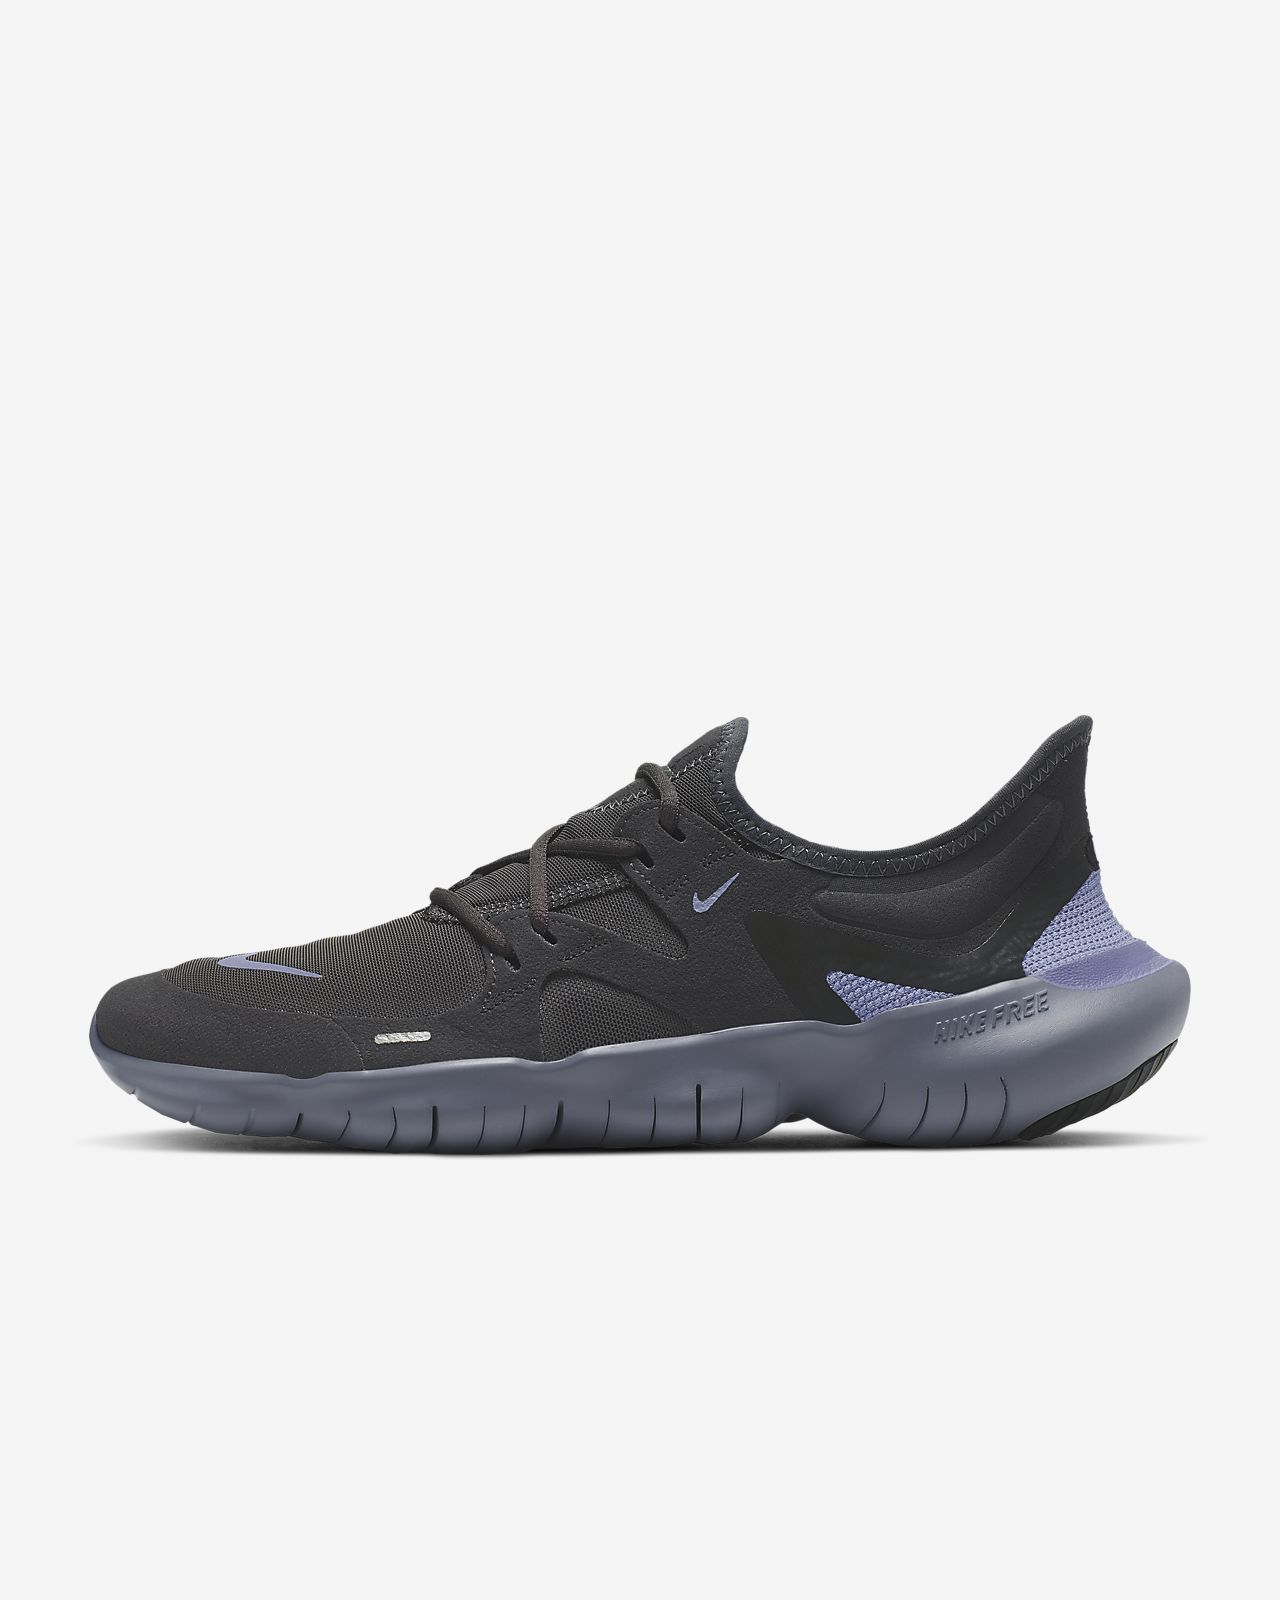 buy online 4b237 df9fd Men s Running Shoe. Nike Free RN 5.0